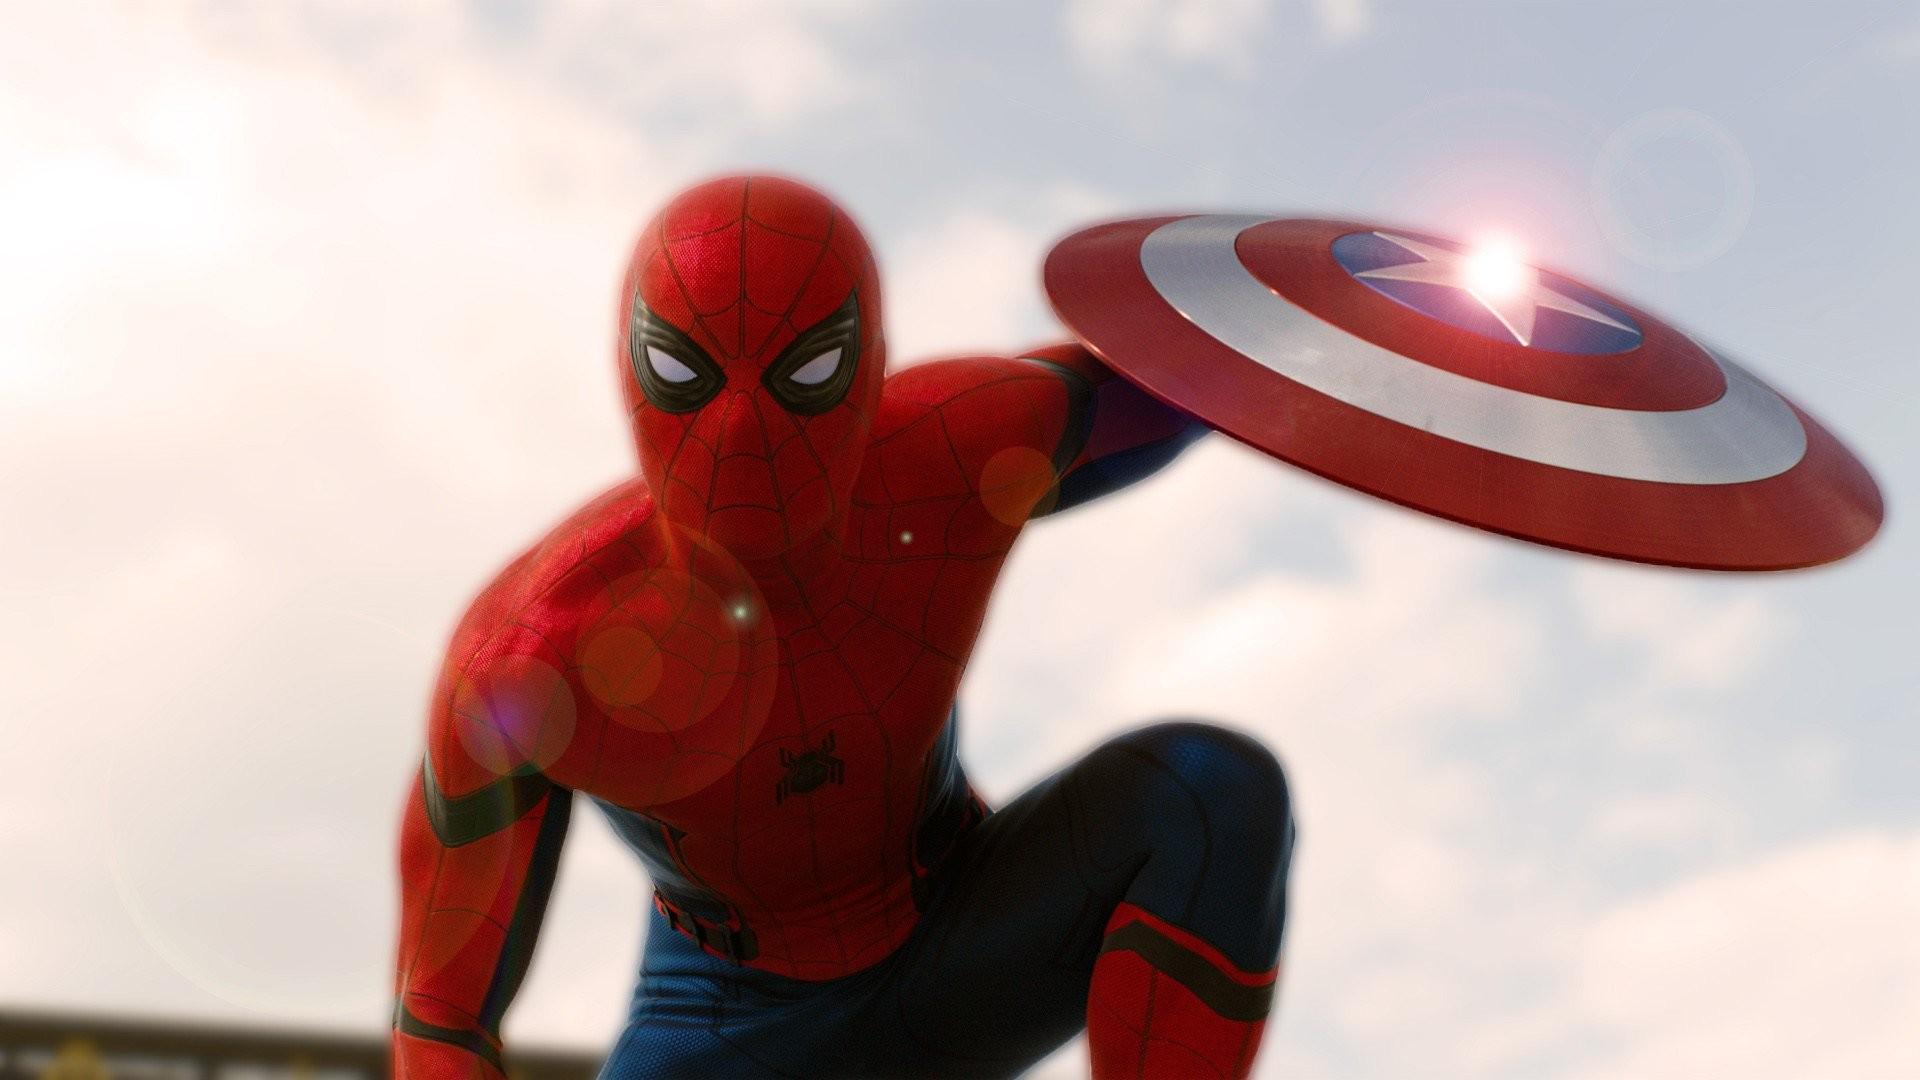 Captain America Iphone Wallpaper Photo Phone Thor Hd Civil War .